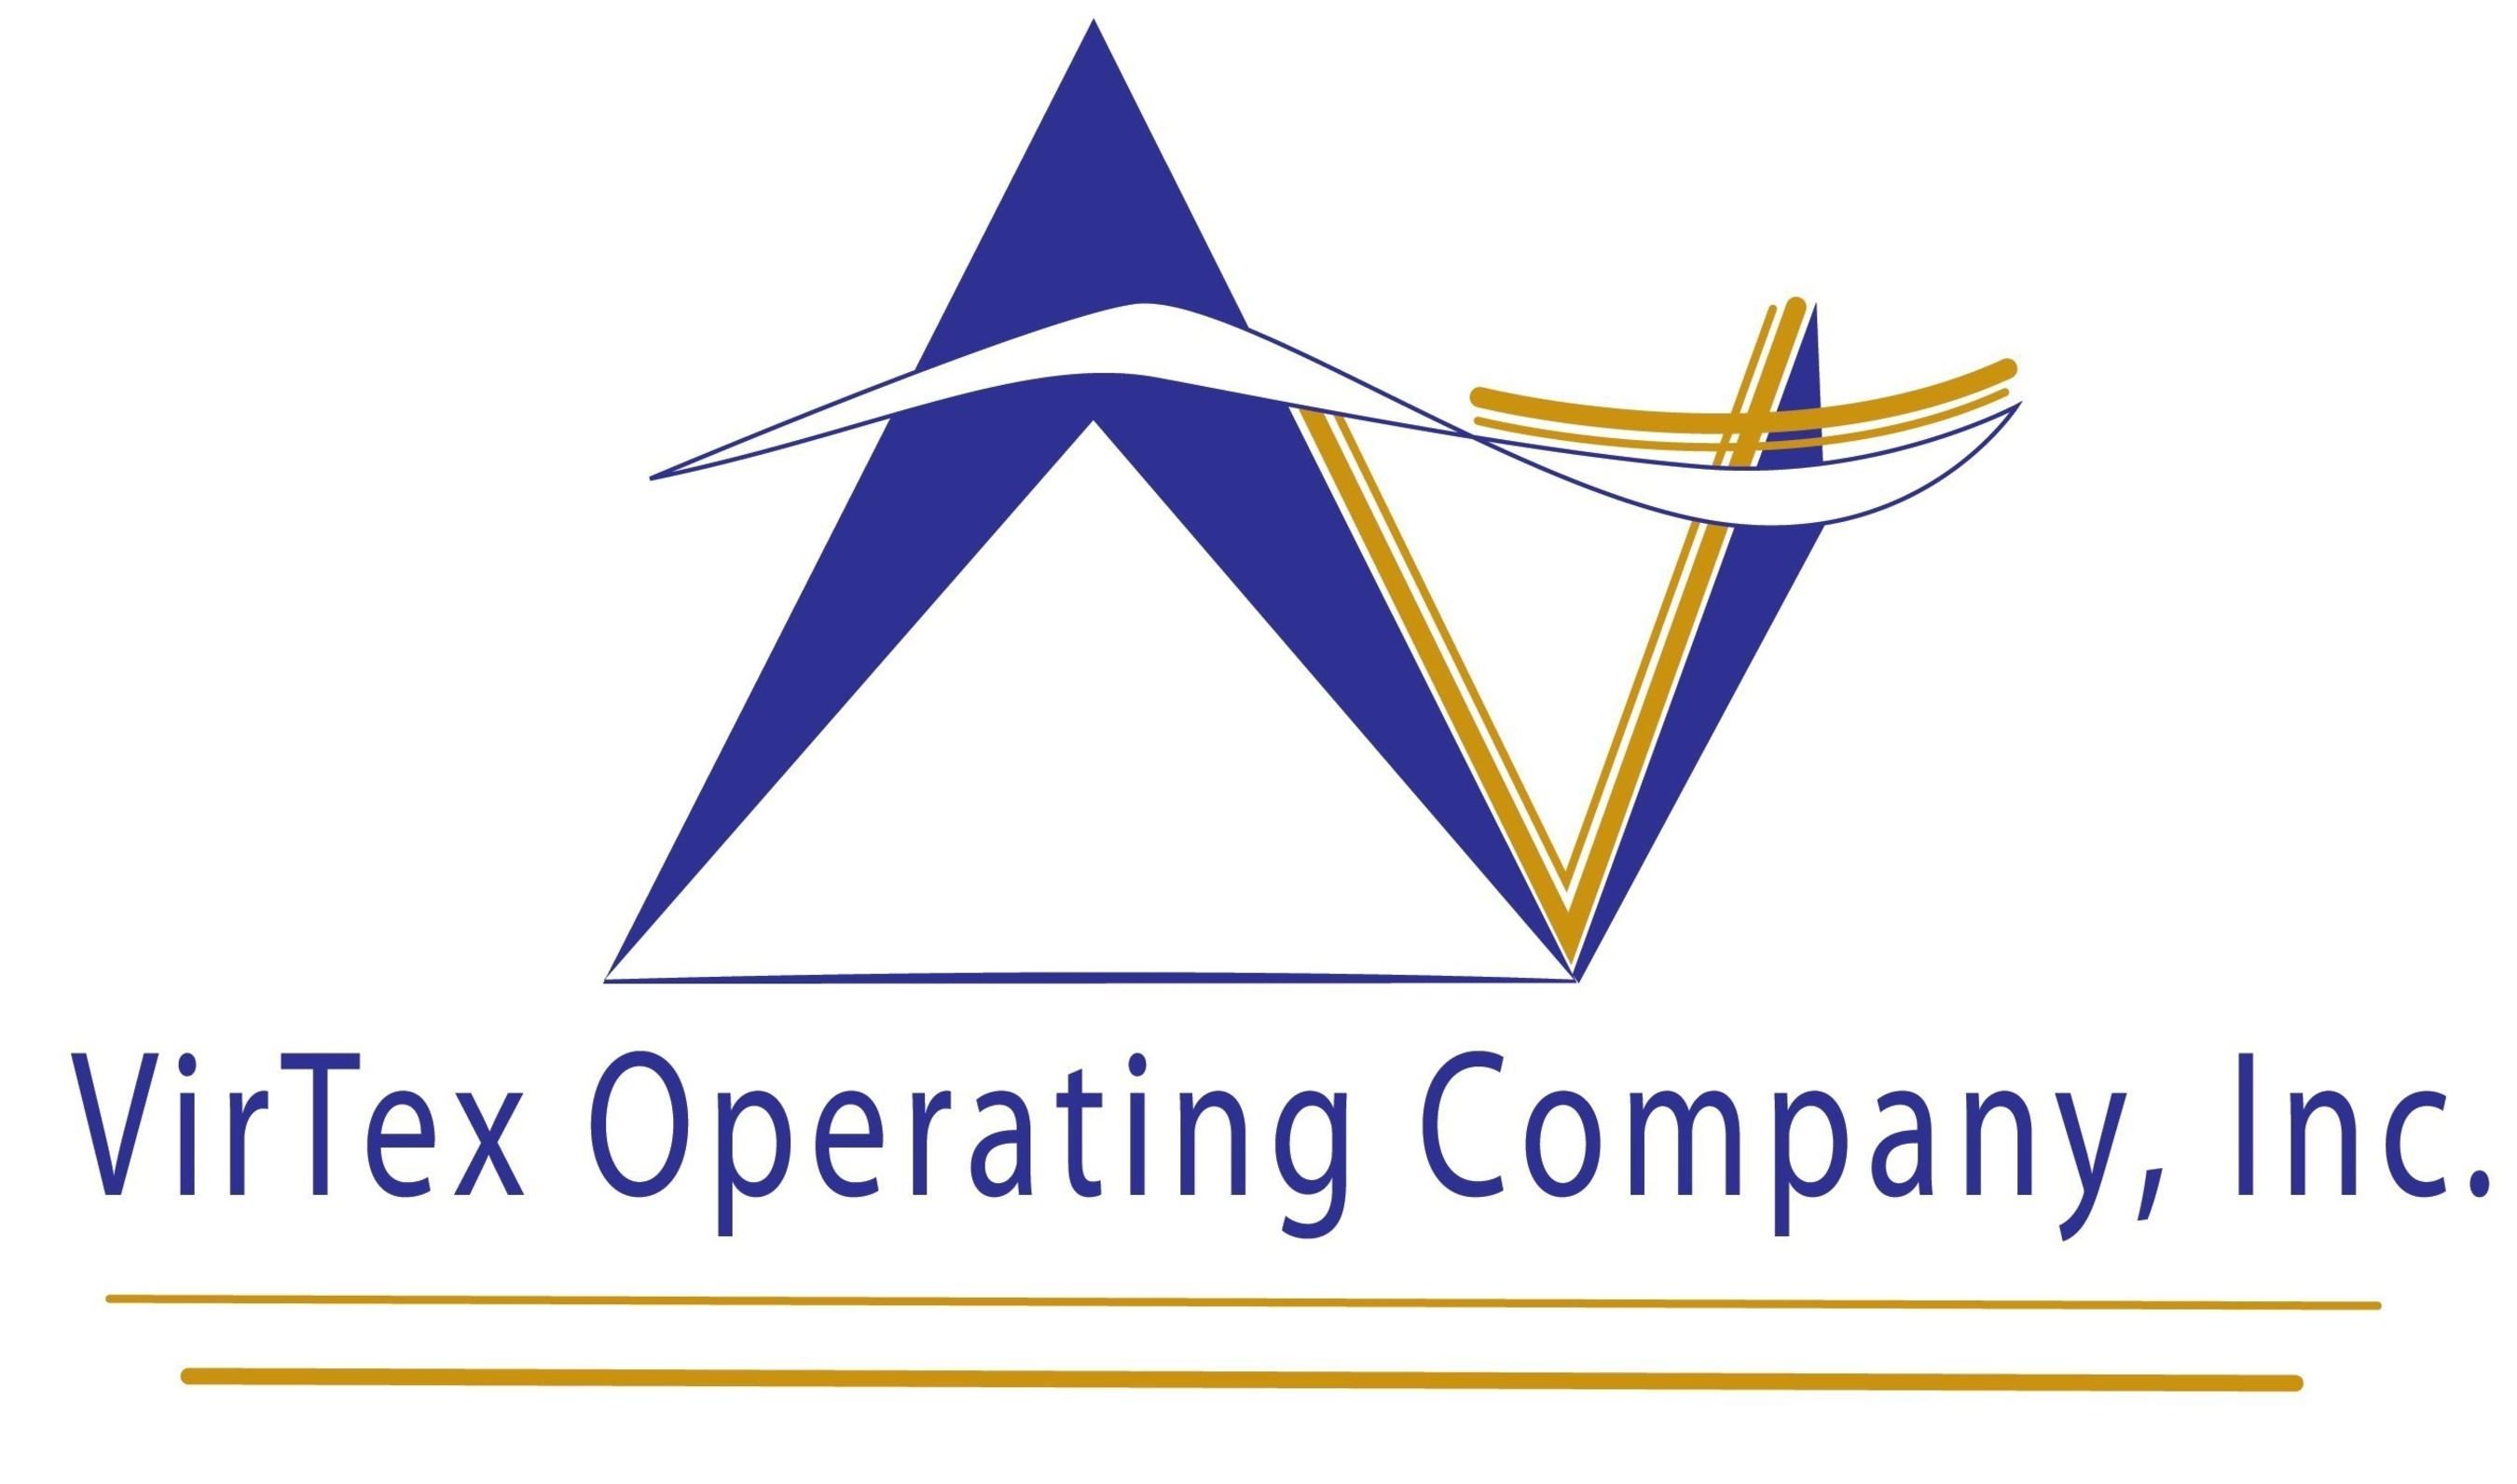 VirTex Operating Company, Inc. Assets for Sale